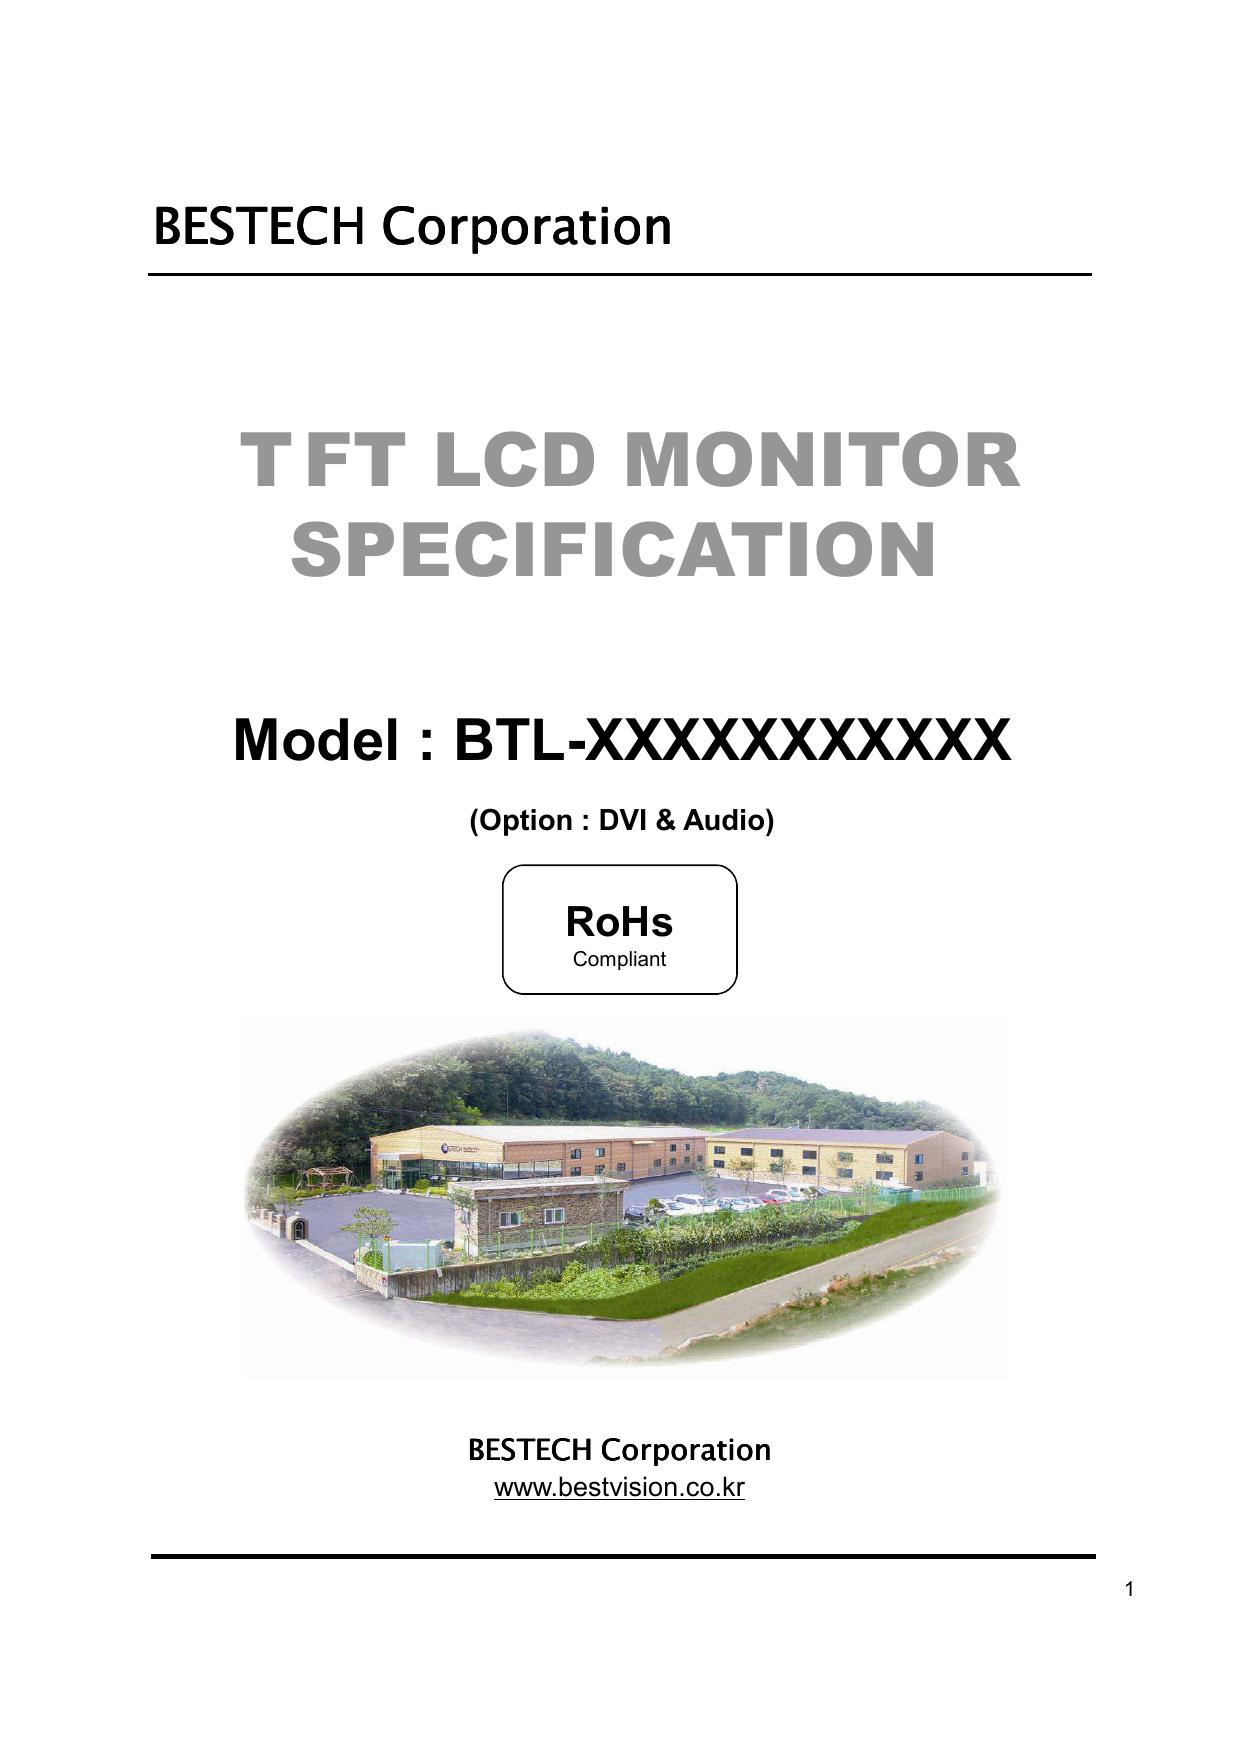 Microsoft PowerPoint - BESTECH manual - 20120719 [\310